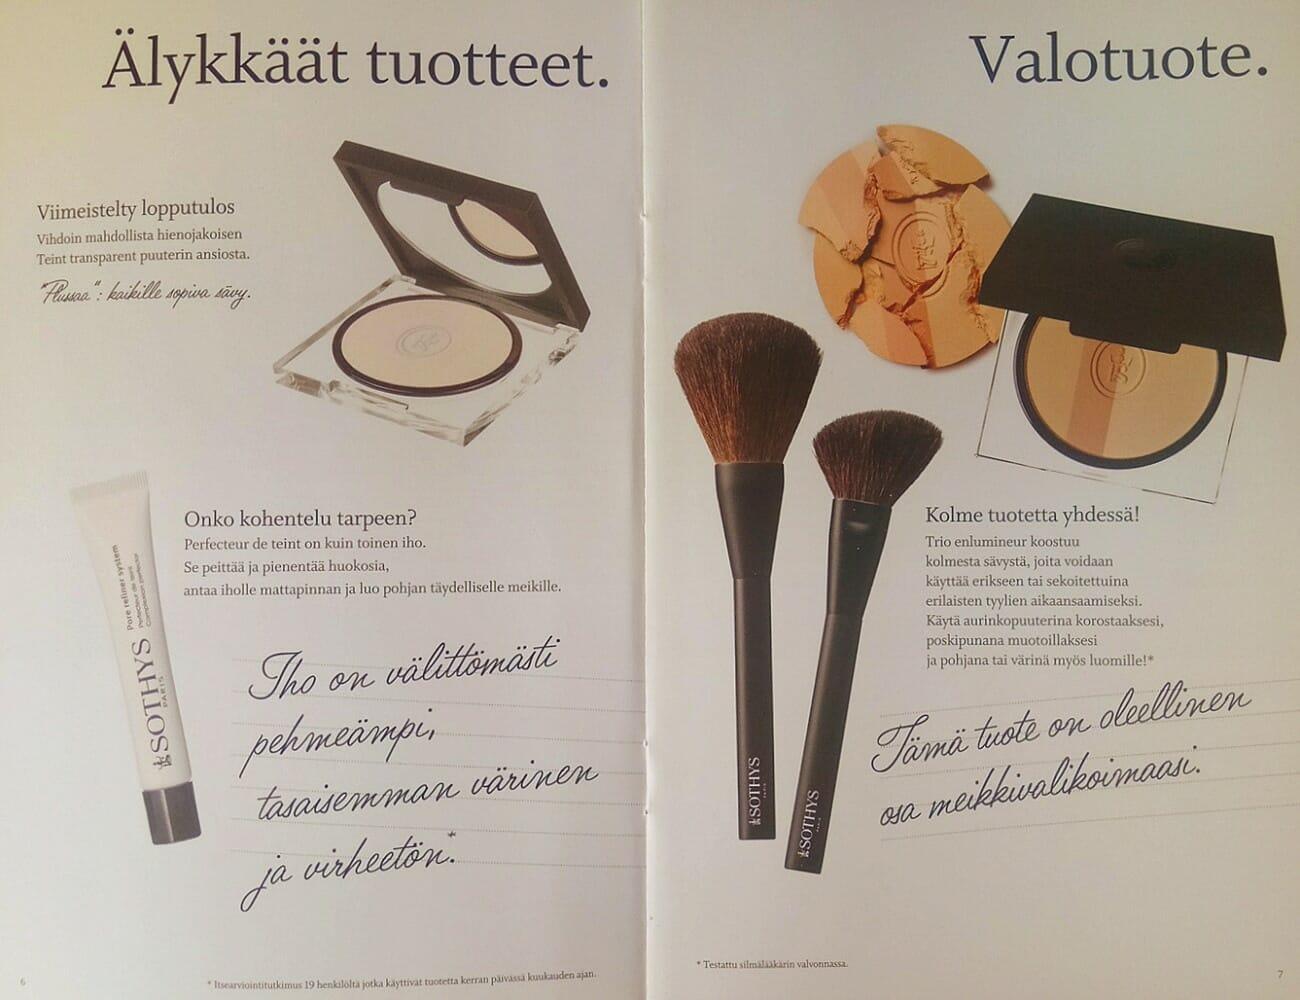 Sothys MakeUp Esite 2018 sivu 04 Kauneushoitola BellaHelena Oulu Helena & Paris Oy Helena ja Markku Tauriainen Suomi 100 Finland